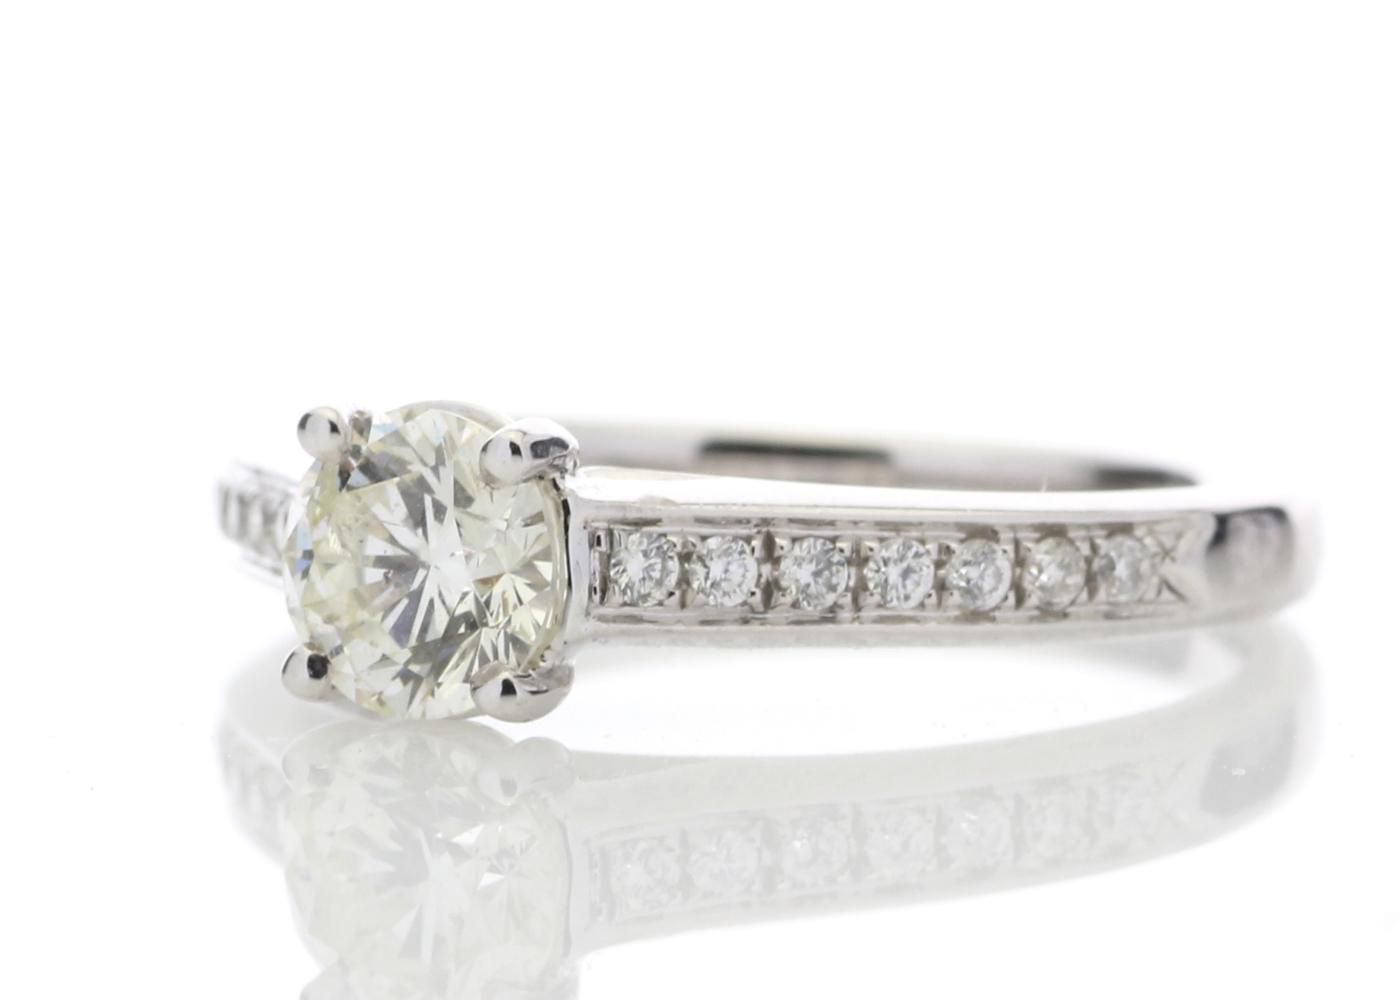 18ct White Gold Single Stone Claw Set Diamond Ring 0.73 Carats - Image 2 of 4